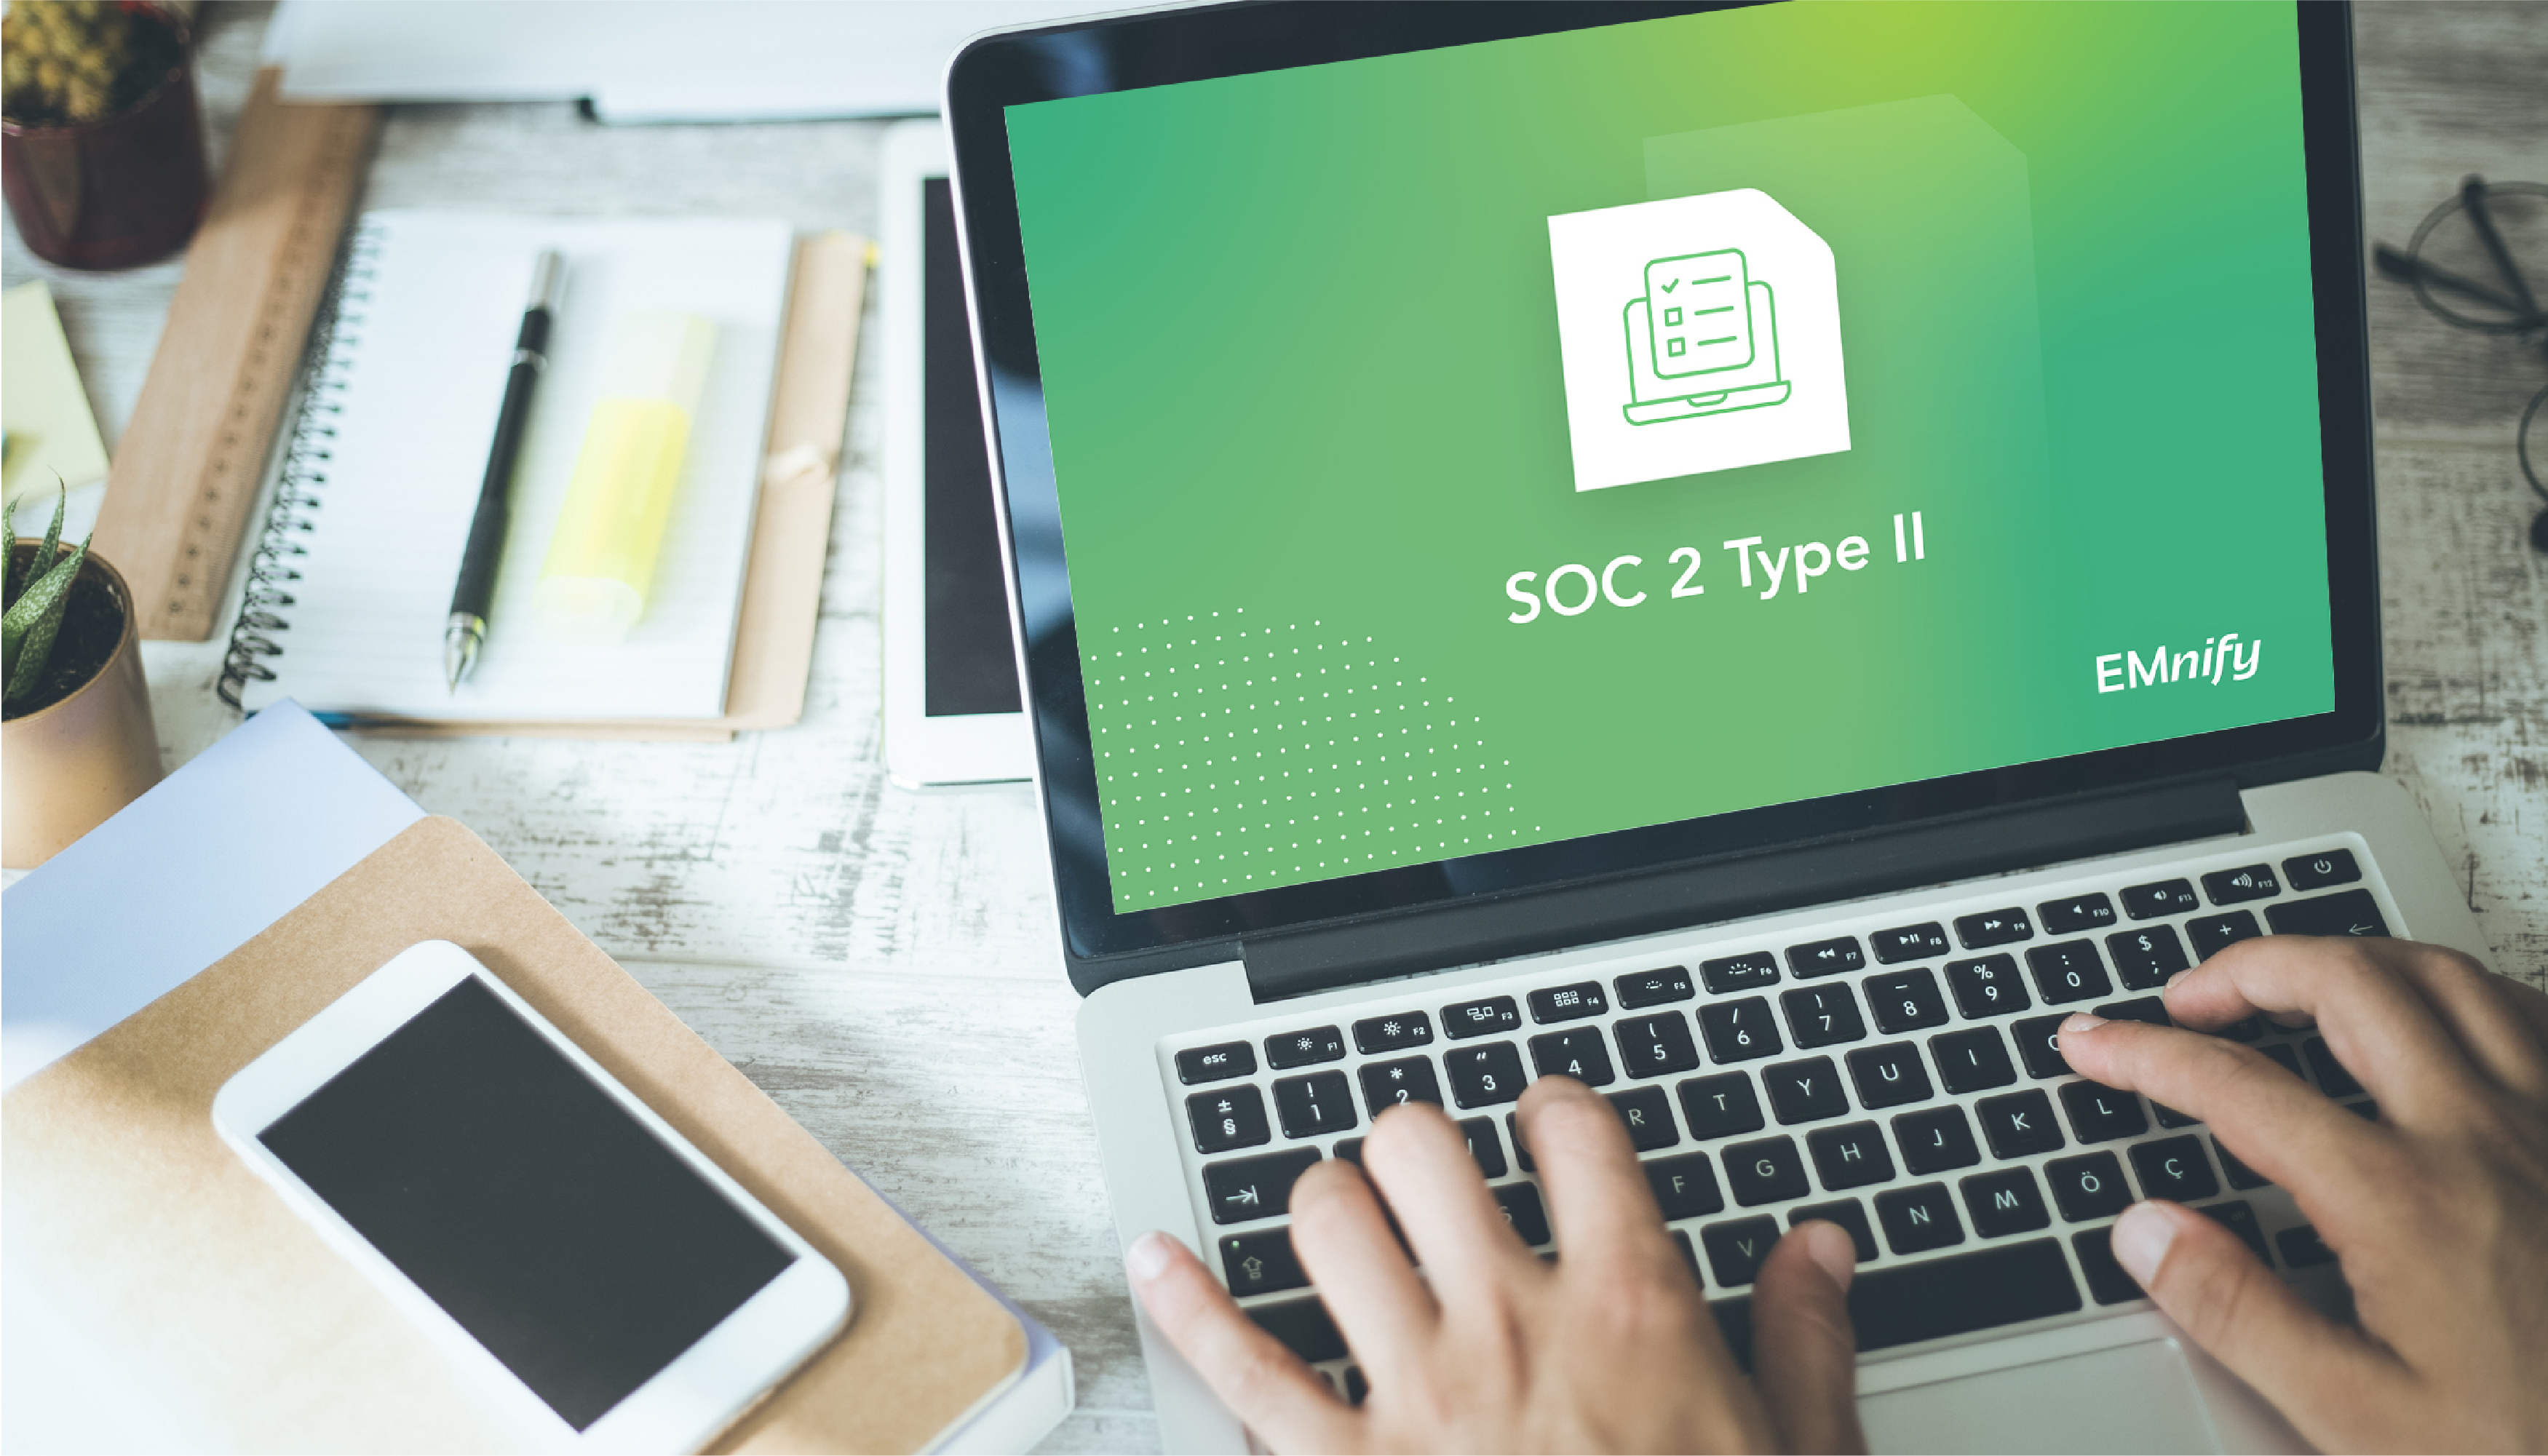 Website-imagery-SOC-2-type-2 -40-1